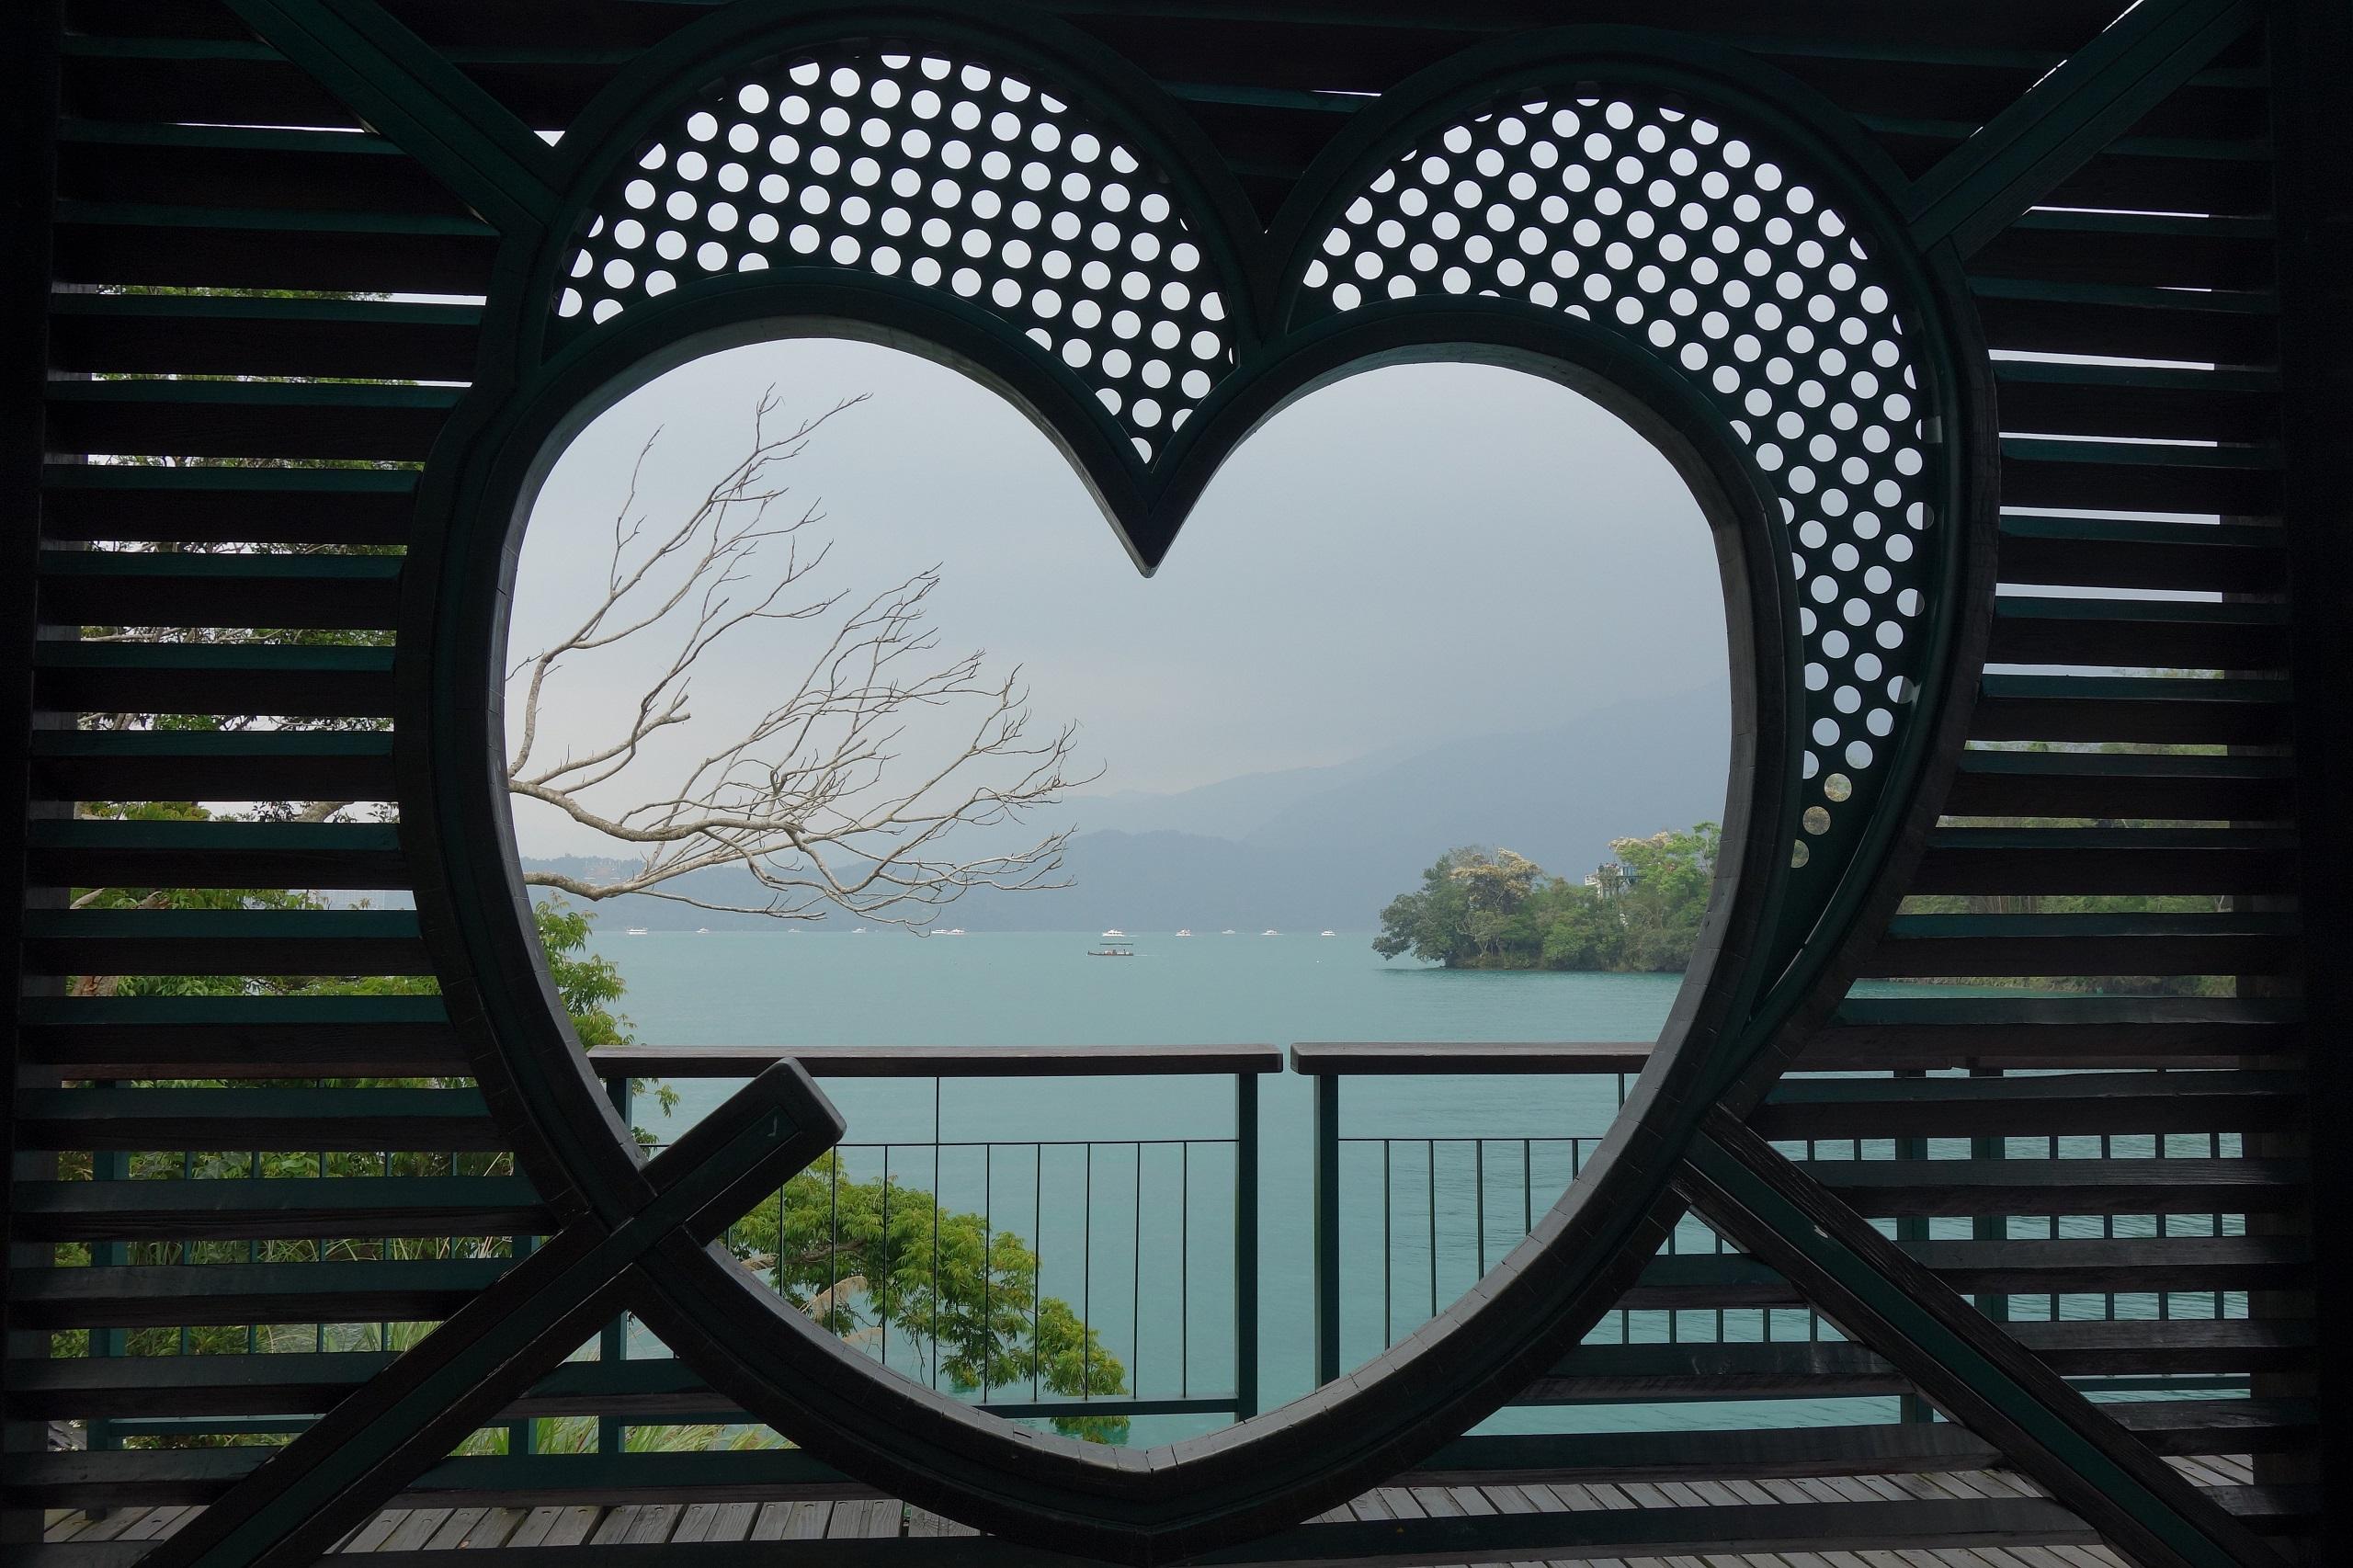 Sun Moon Lake - jedna z atrakcji Tajwanu